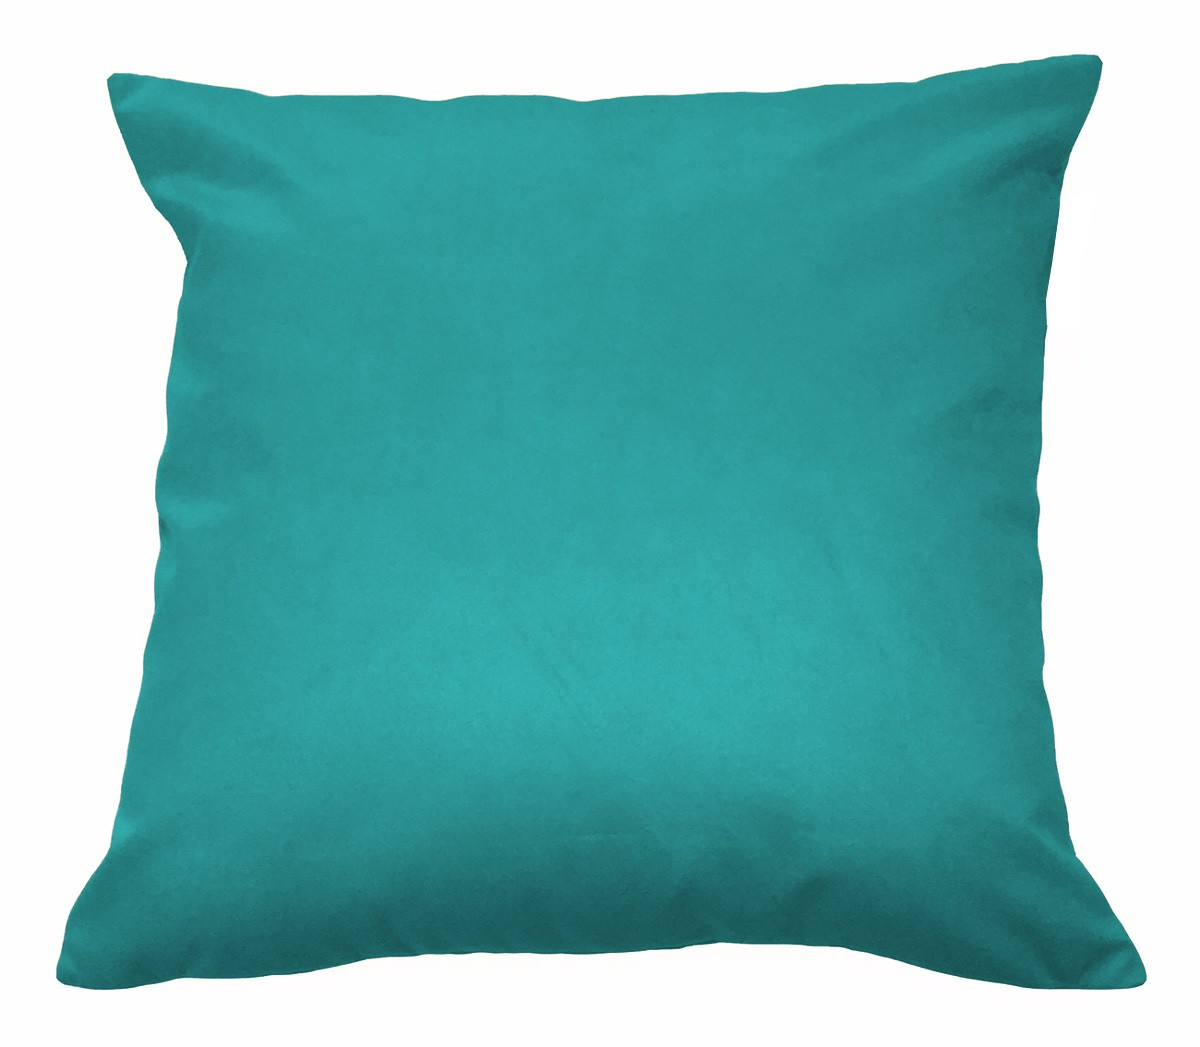 Kit 2 Almofadas Decorativas 40x40 Tecido Suede Azul Tiffany